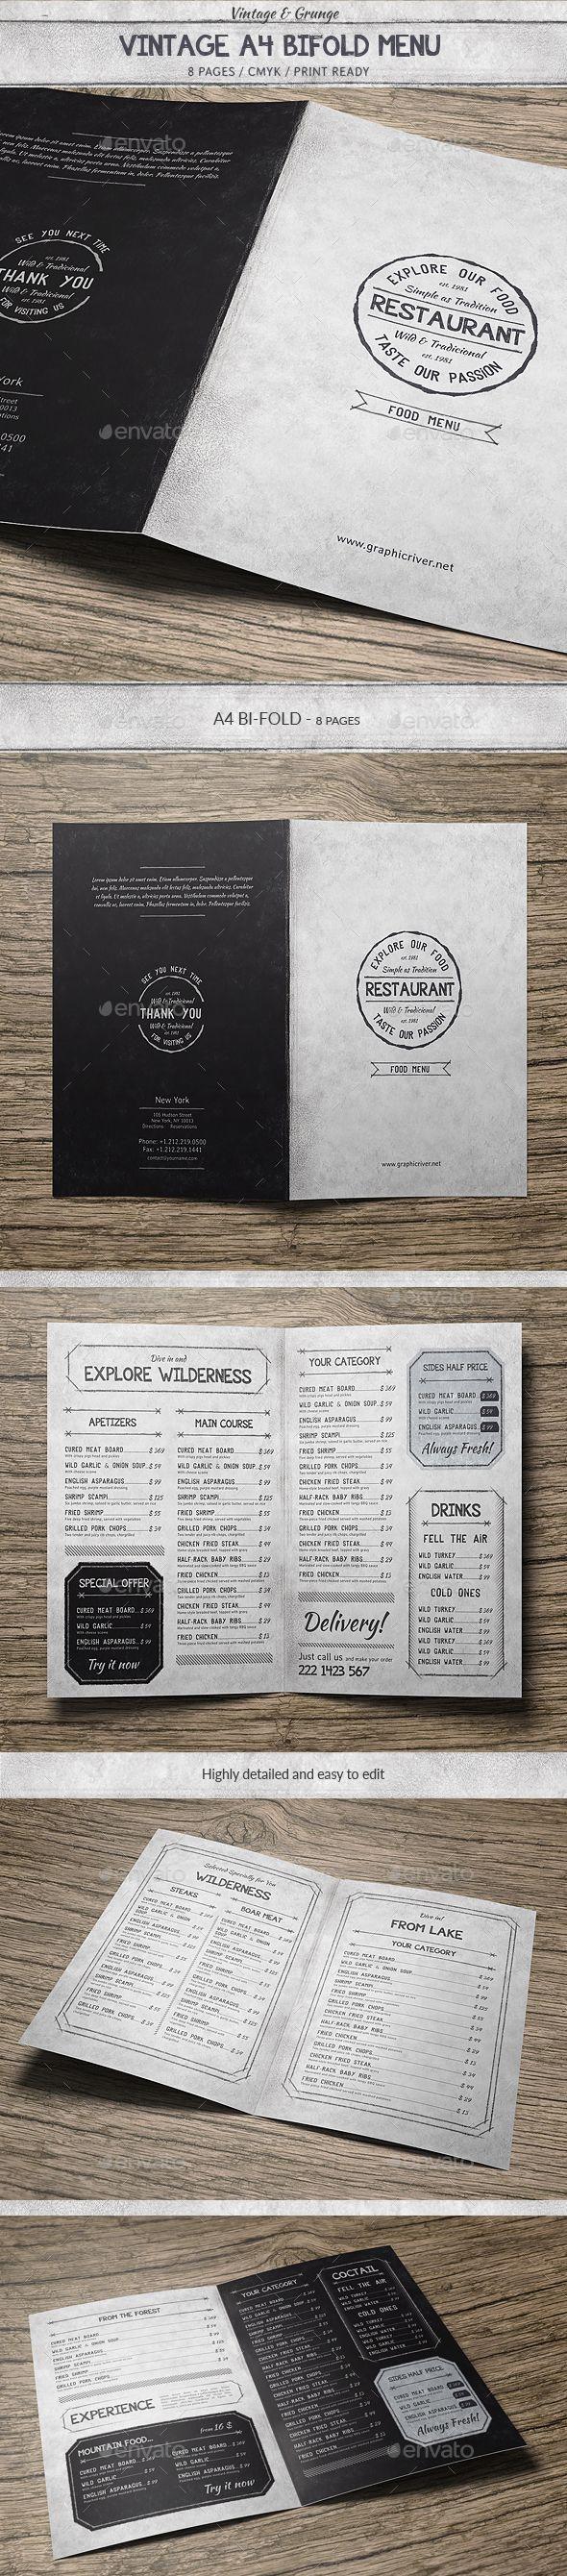 455 best trifold restaurant menu template images on pinterest vintage a4 bifold menu pronofoot35fo Choice Image